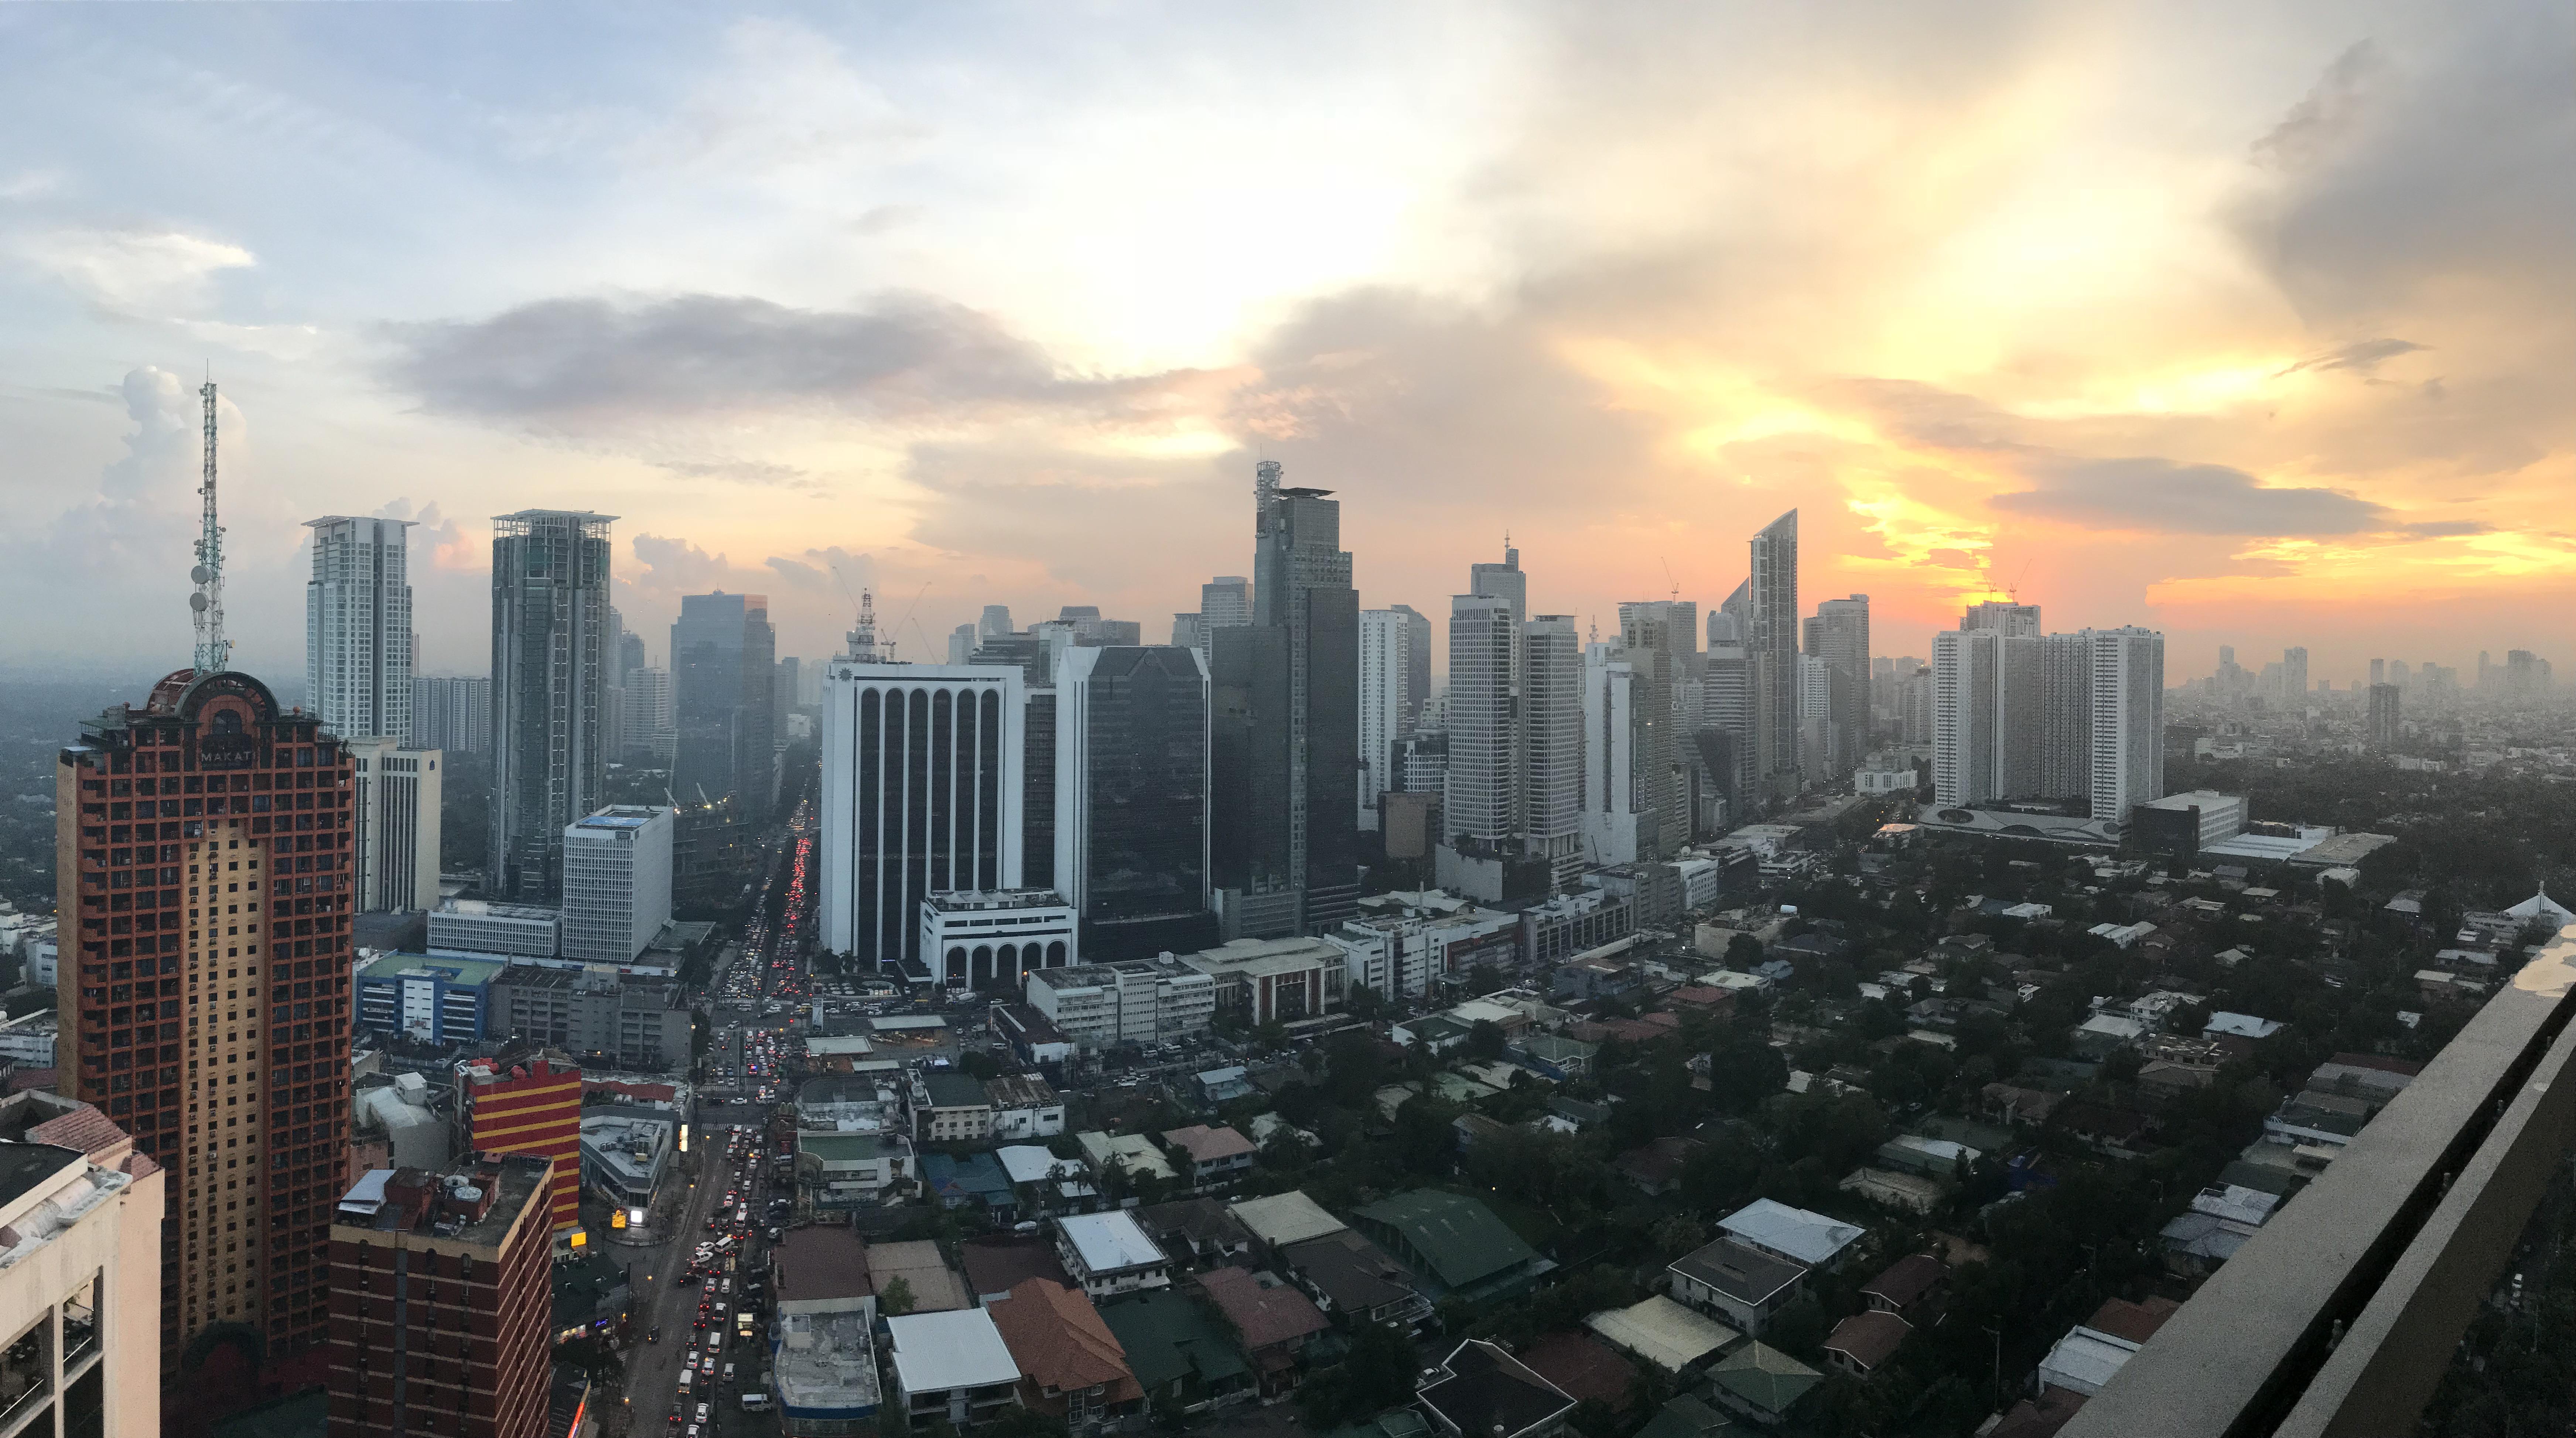 Manila, stolica Filipin (Fot. Foreign Personnel Service)